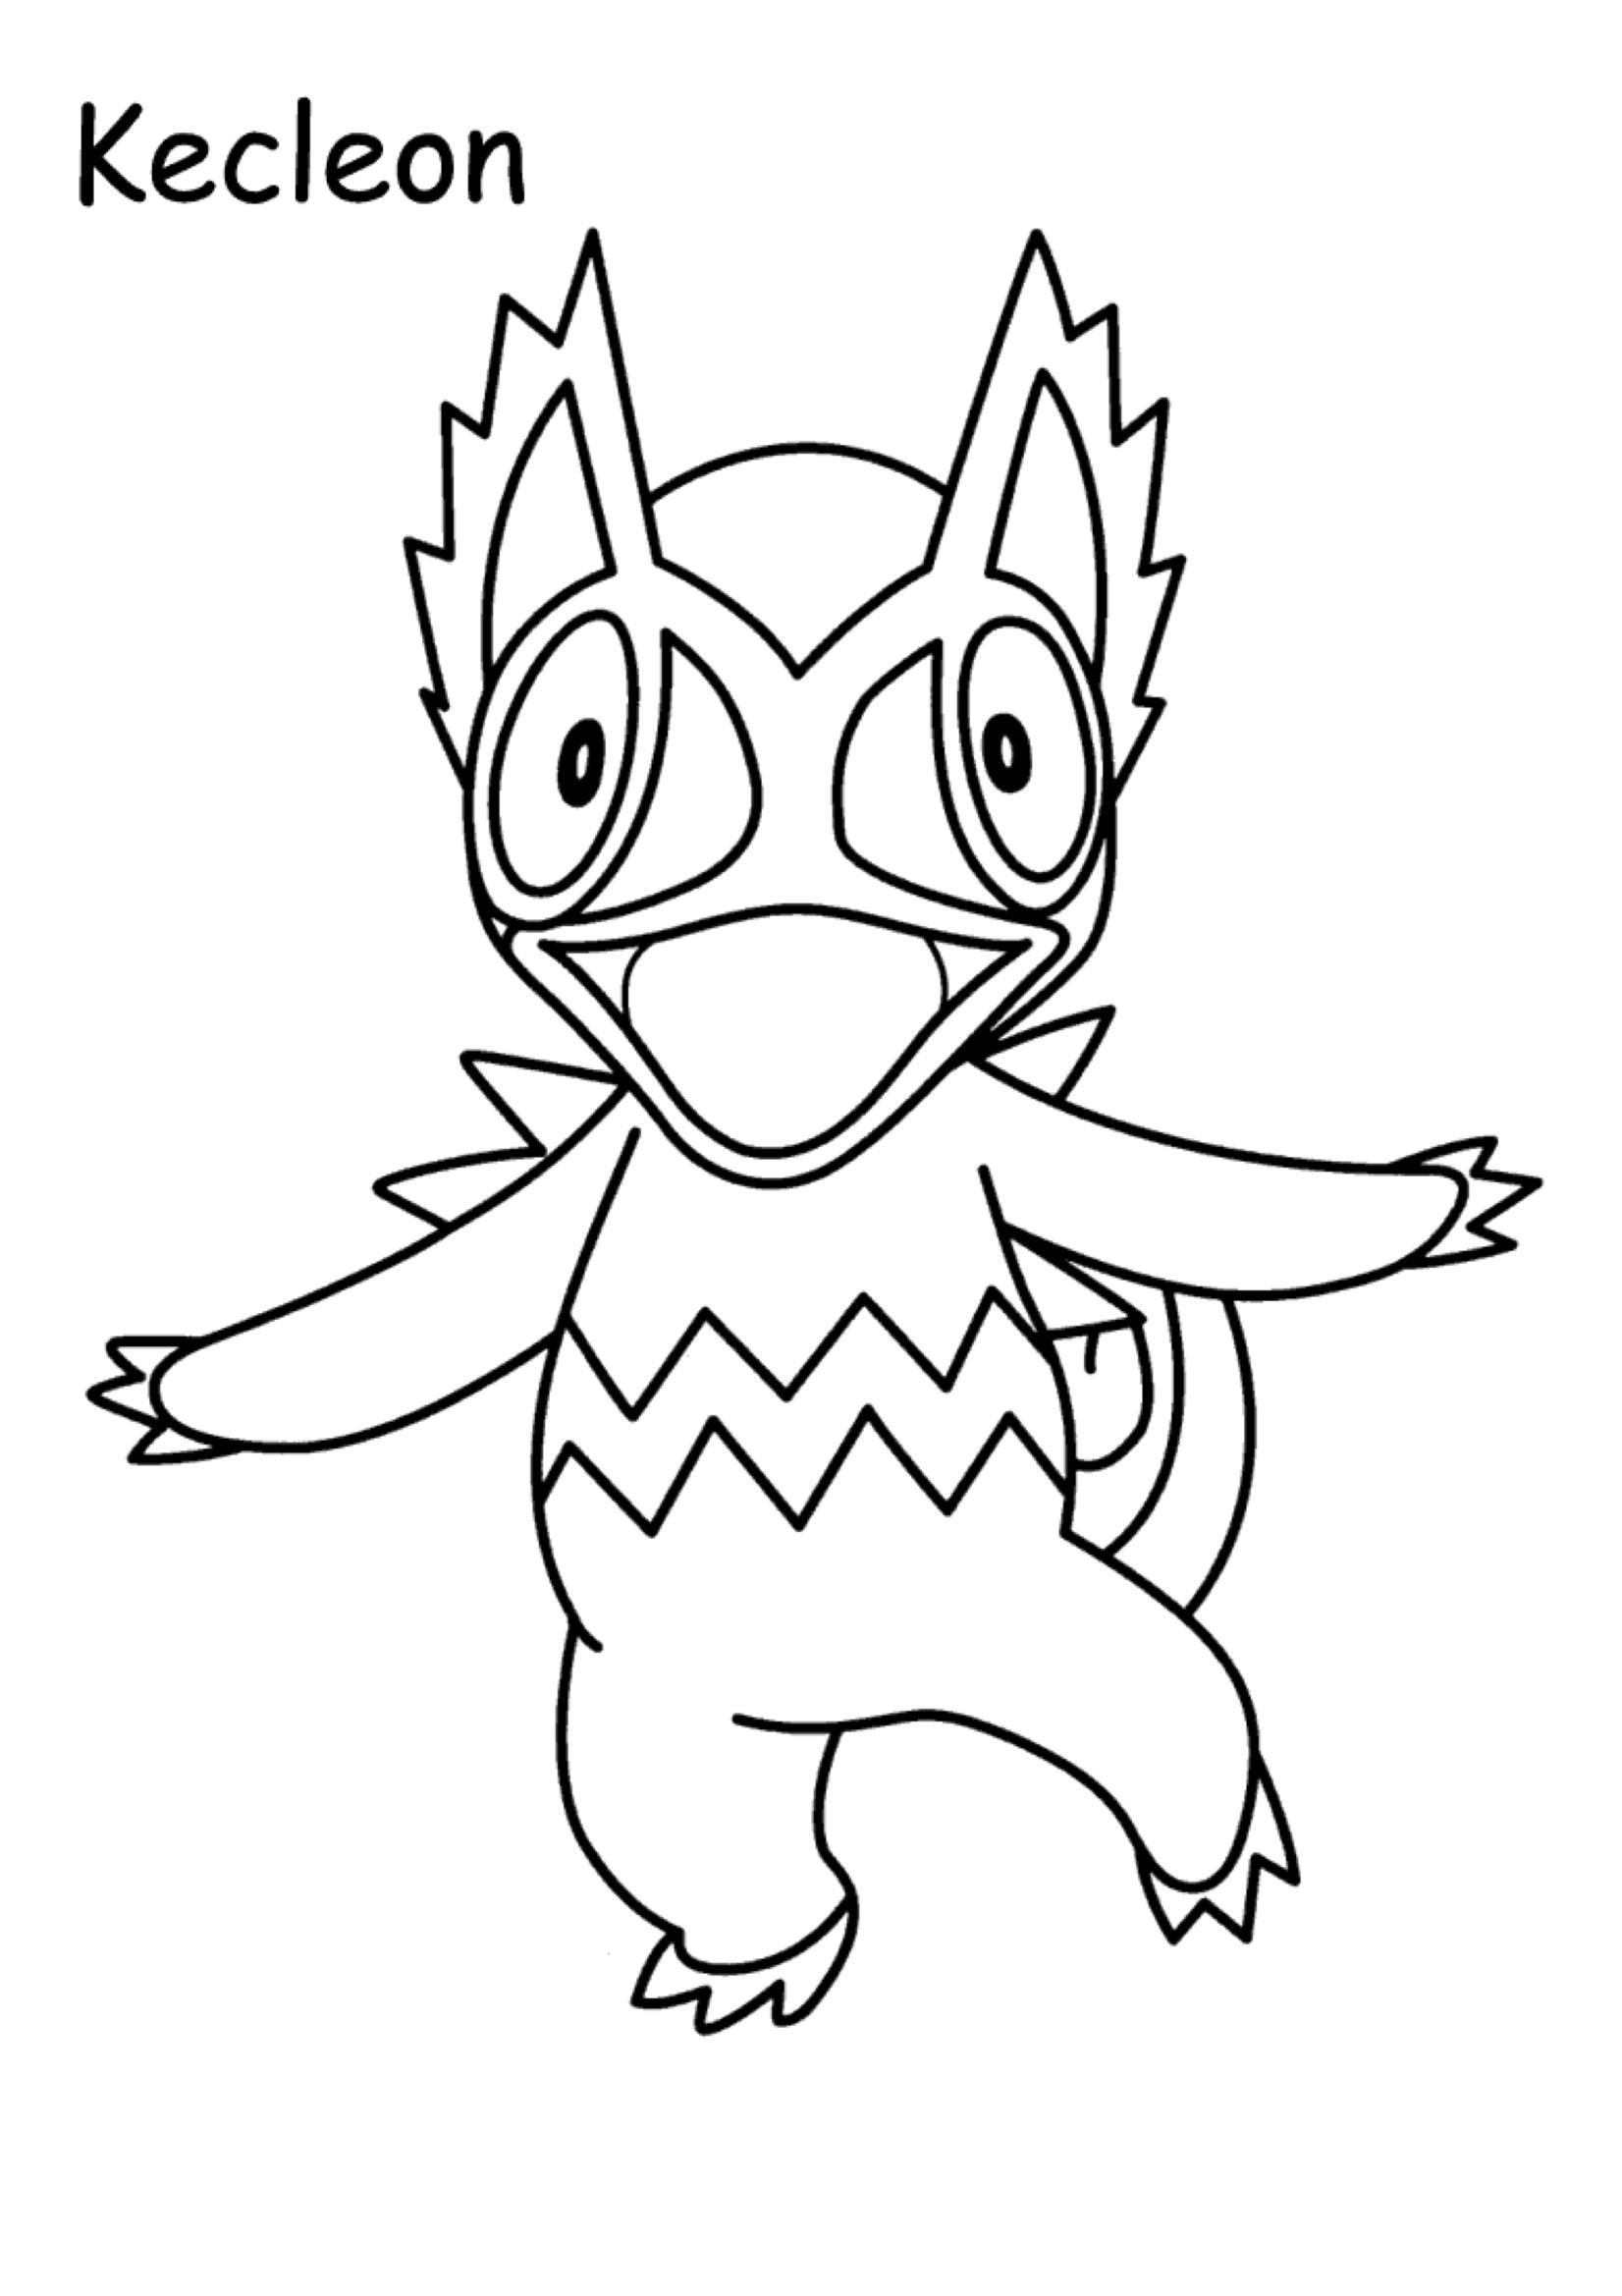 Gratis Kleurplaten Pokemon.Kleuren Nu Pokemon Kecleon Kleurplaten